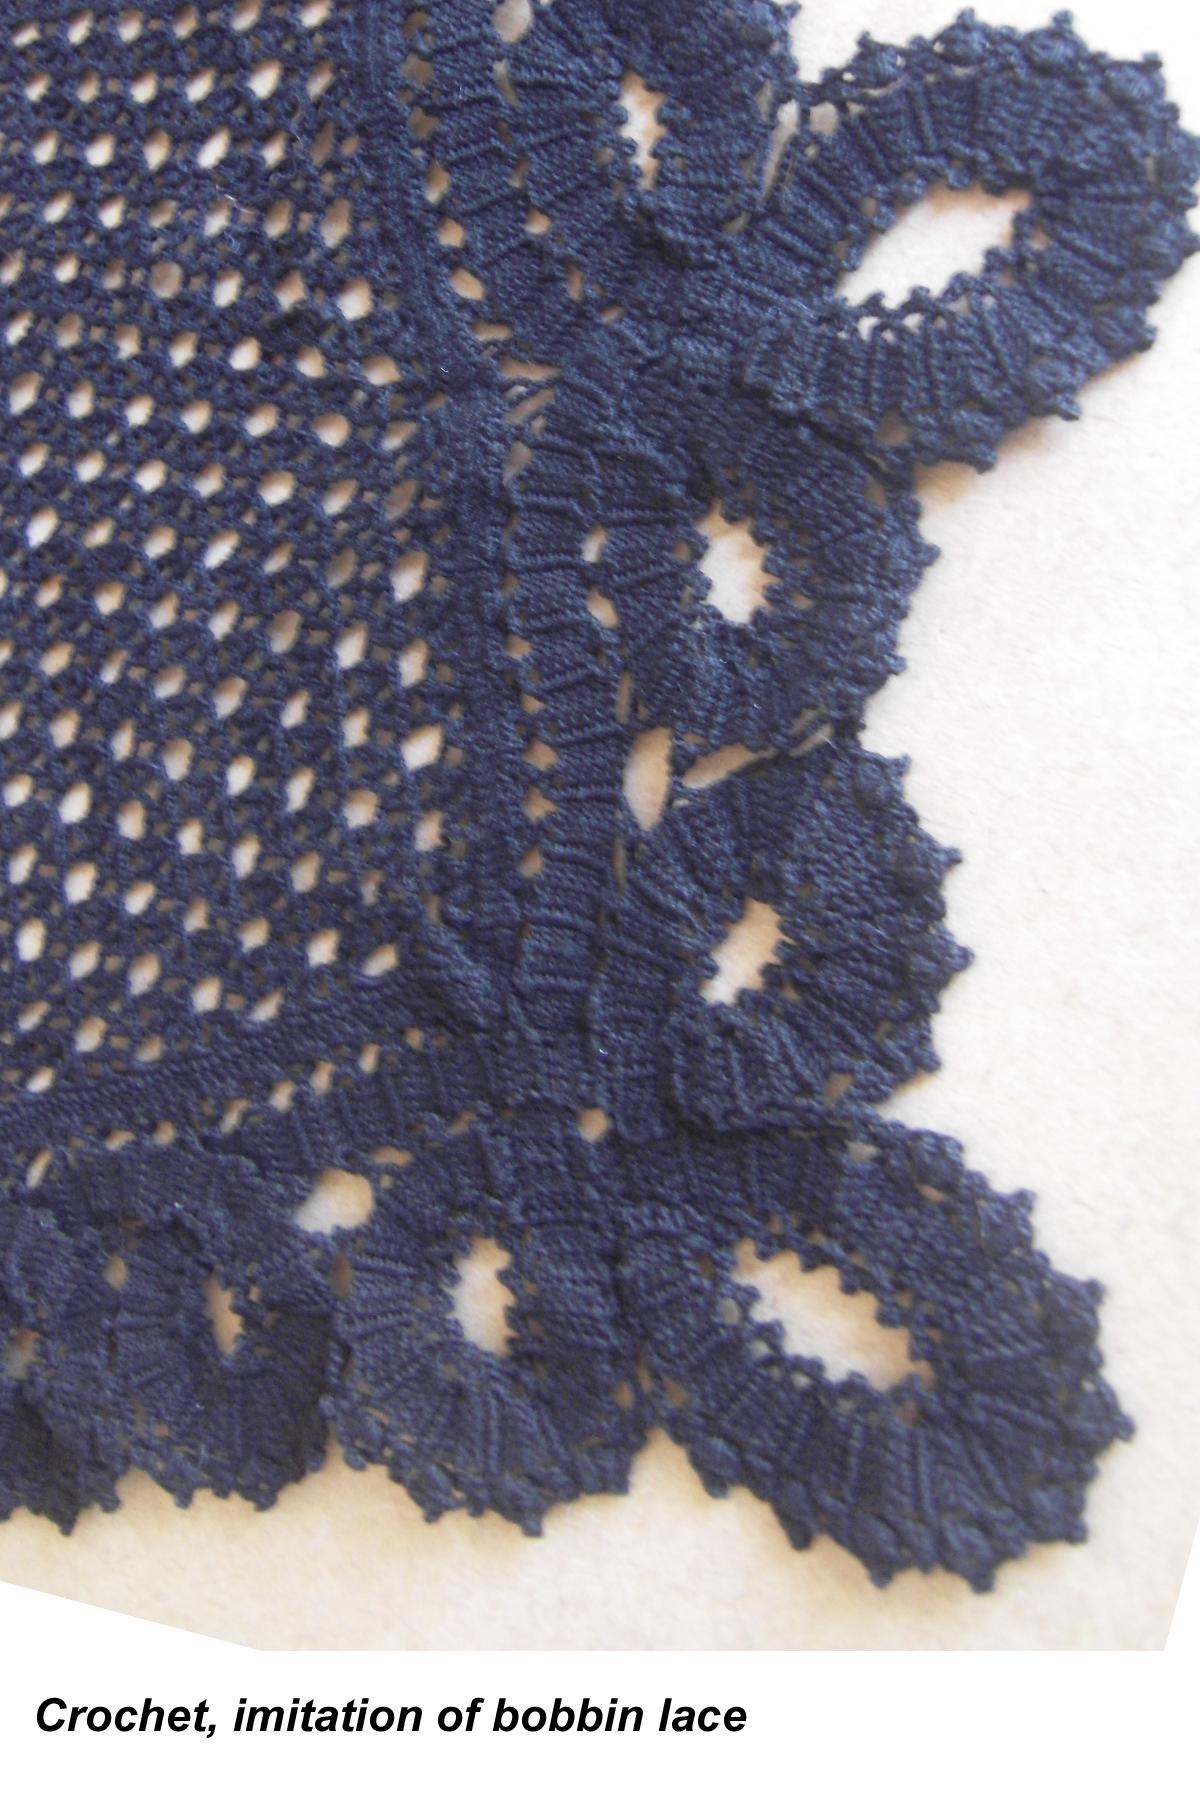 crochet - imitation of bobbin lace